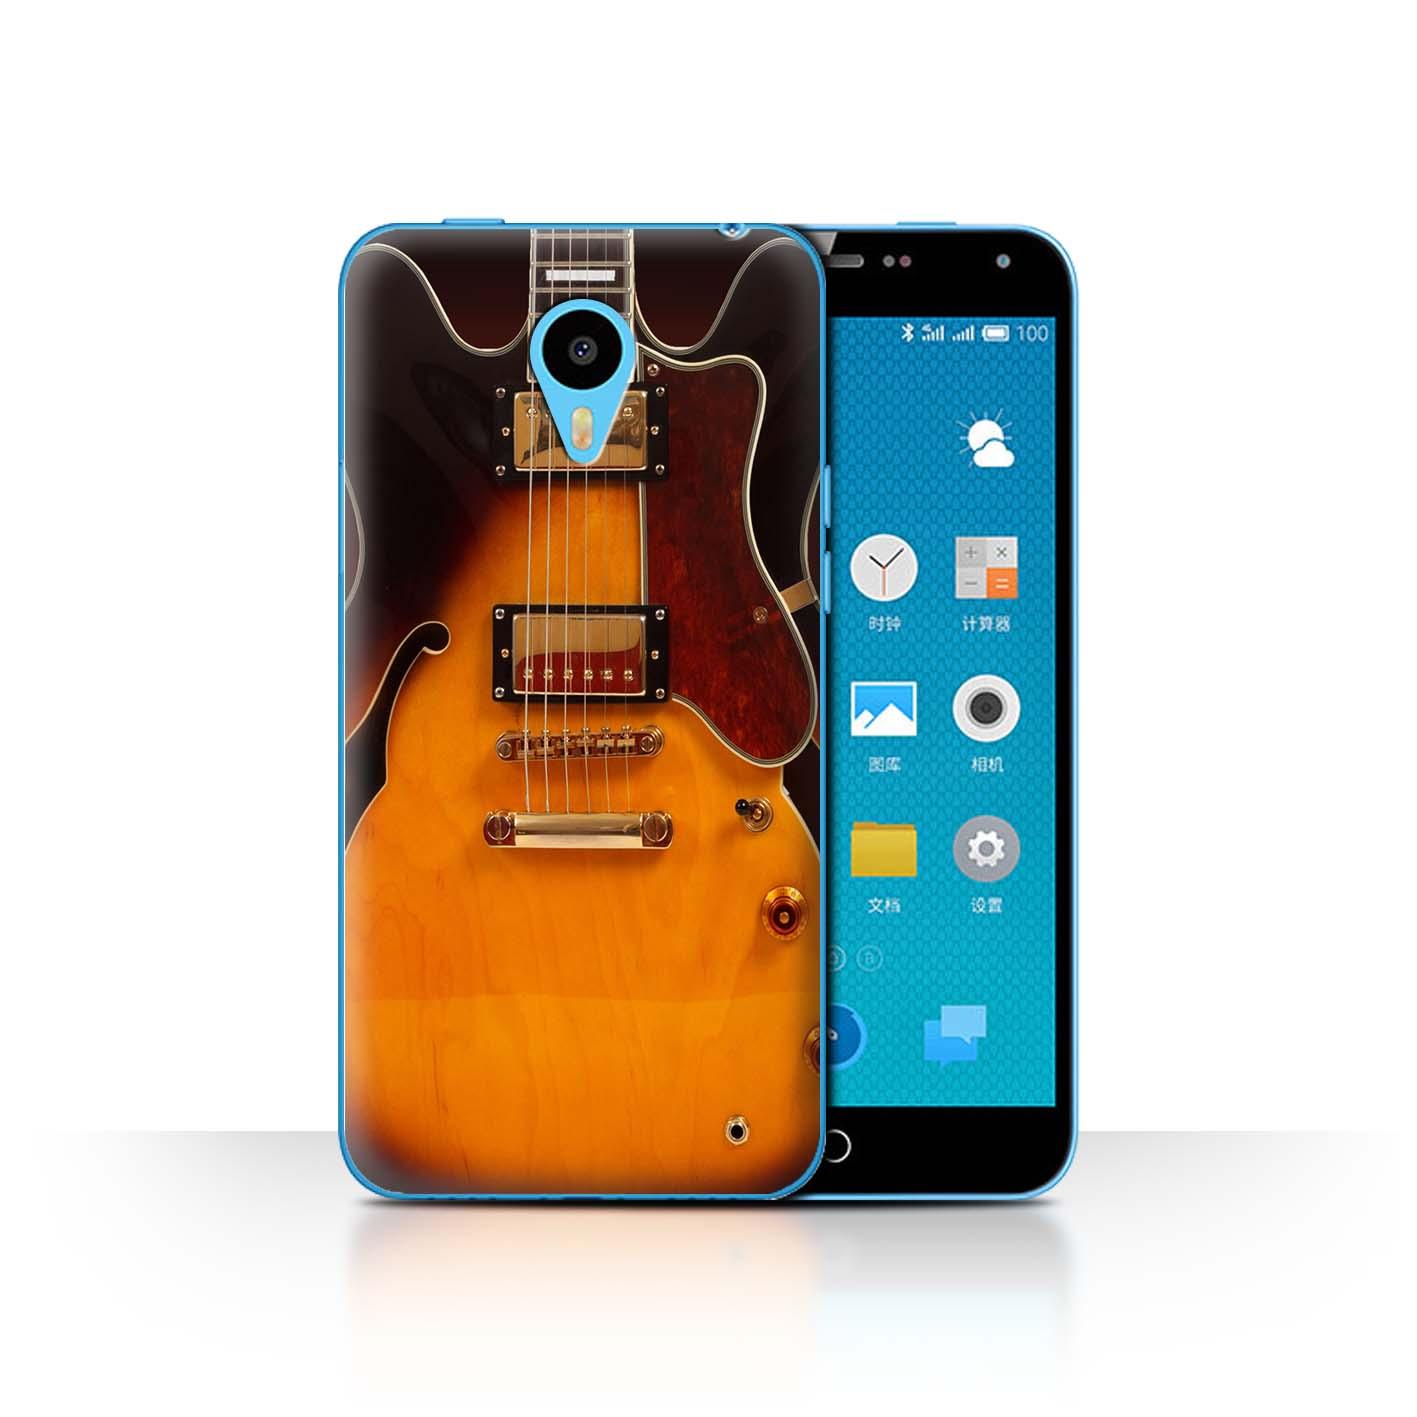 STUFF4-Back-Case-Cover-Skin-for-Meizu-M1N-Guitar